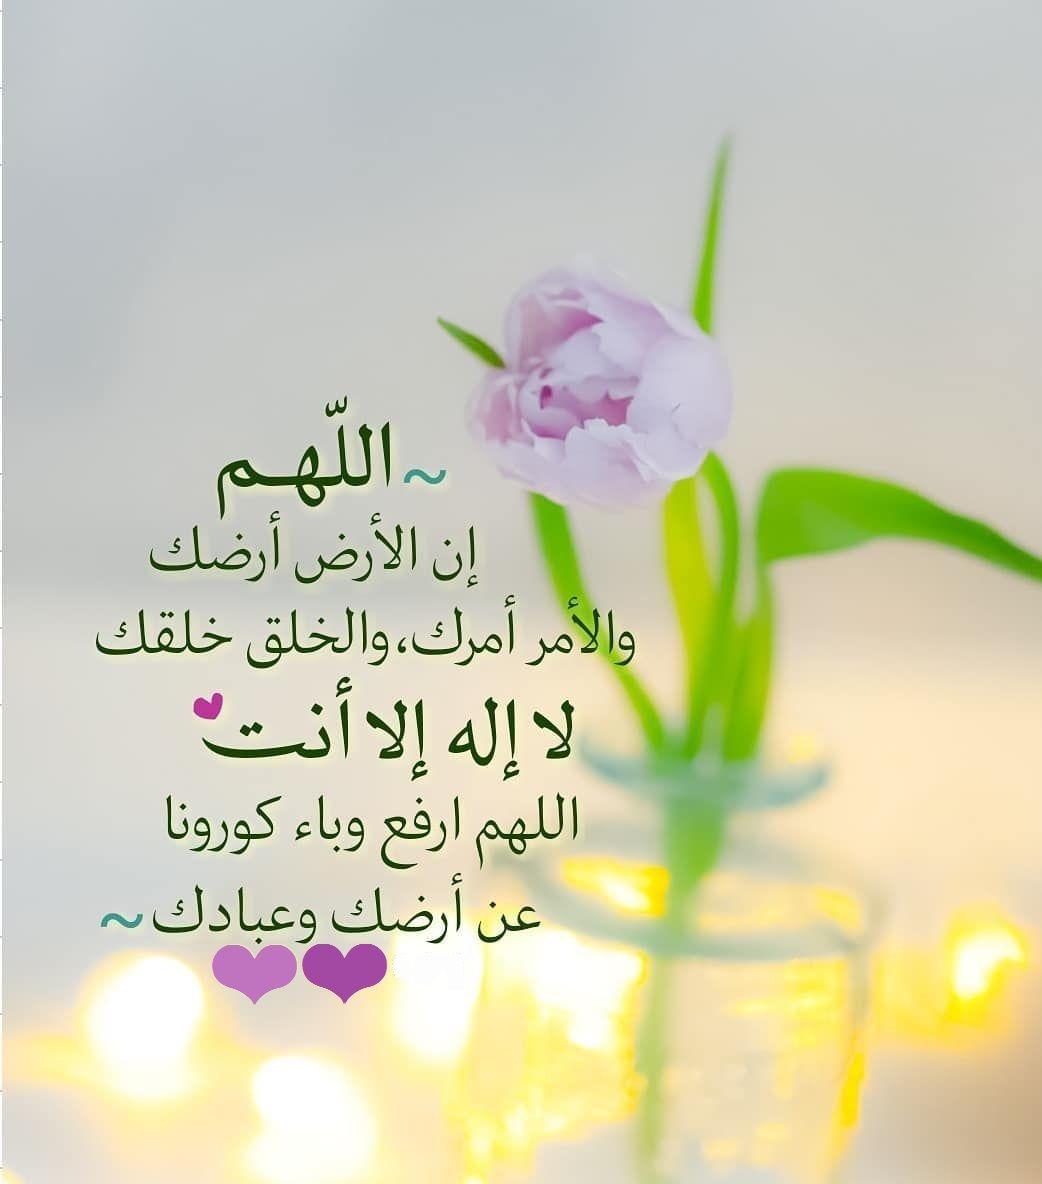 Pin By Um Raza On الصلاة على النبي صل الله عليه وسلم Islamic Images Best Islamic Images Islamic Pictures